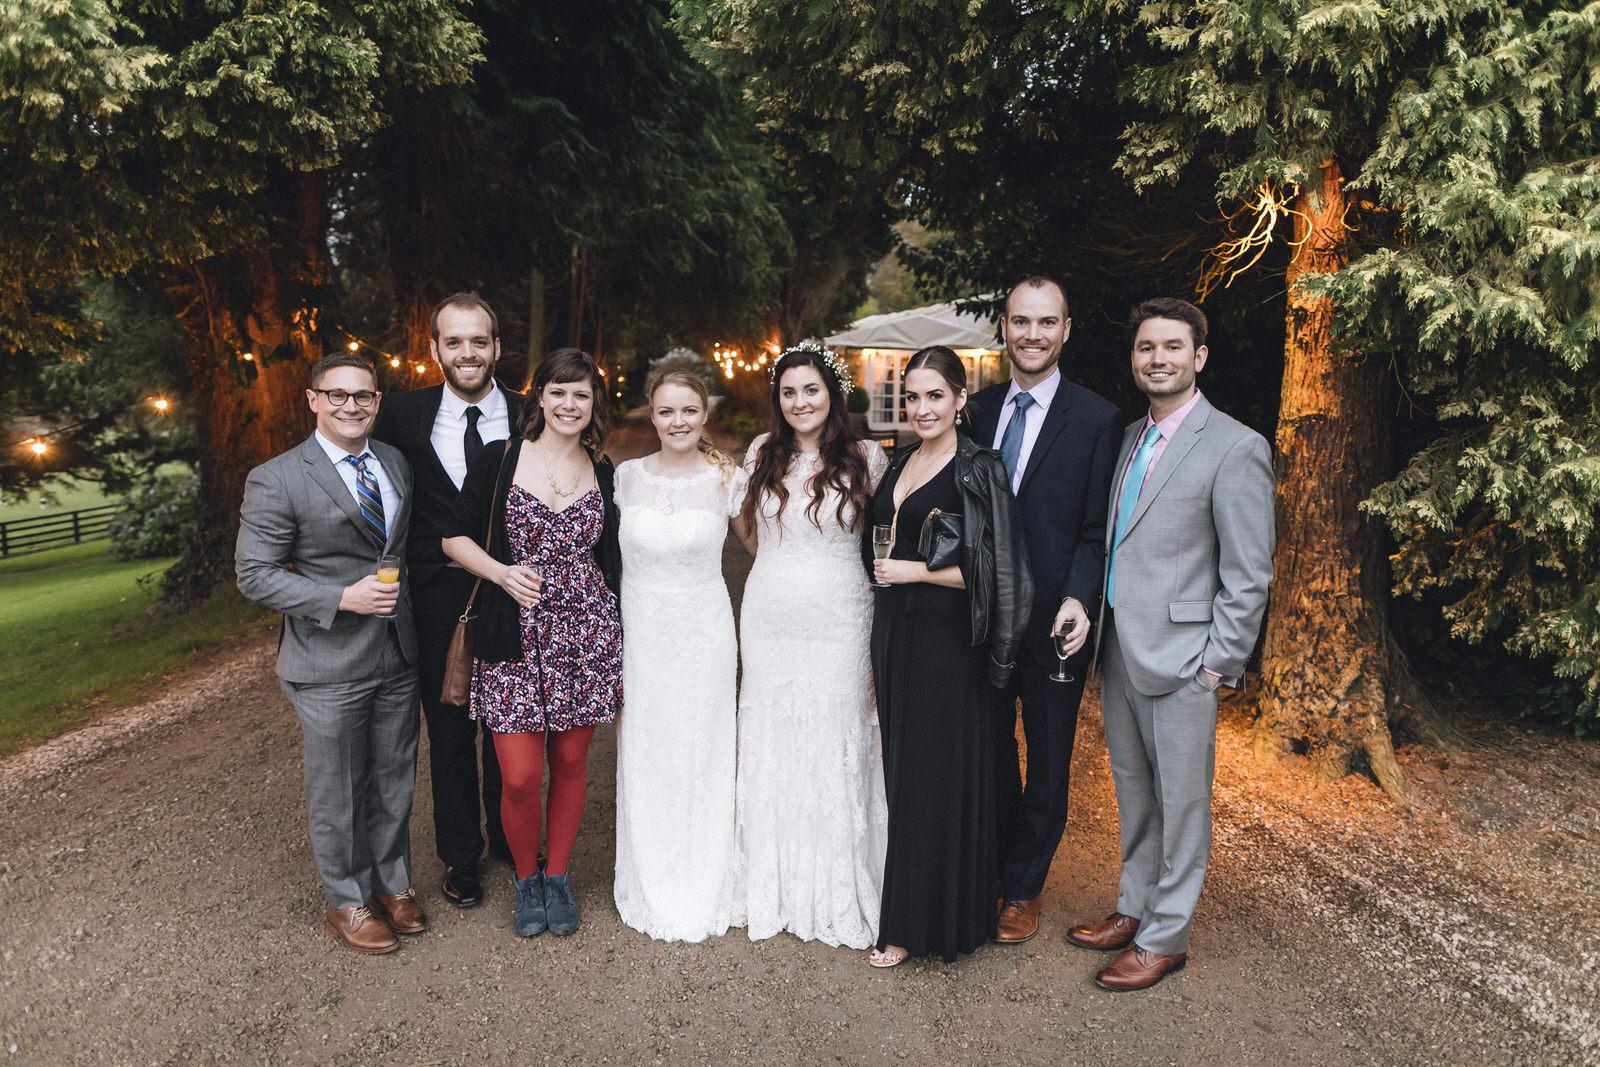 Balybeg-house-ireland-wicklow-wedding-photographer-roger-kenny_greystones106.jpg